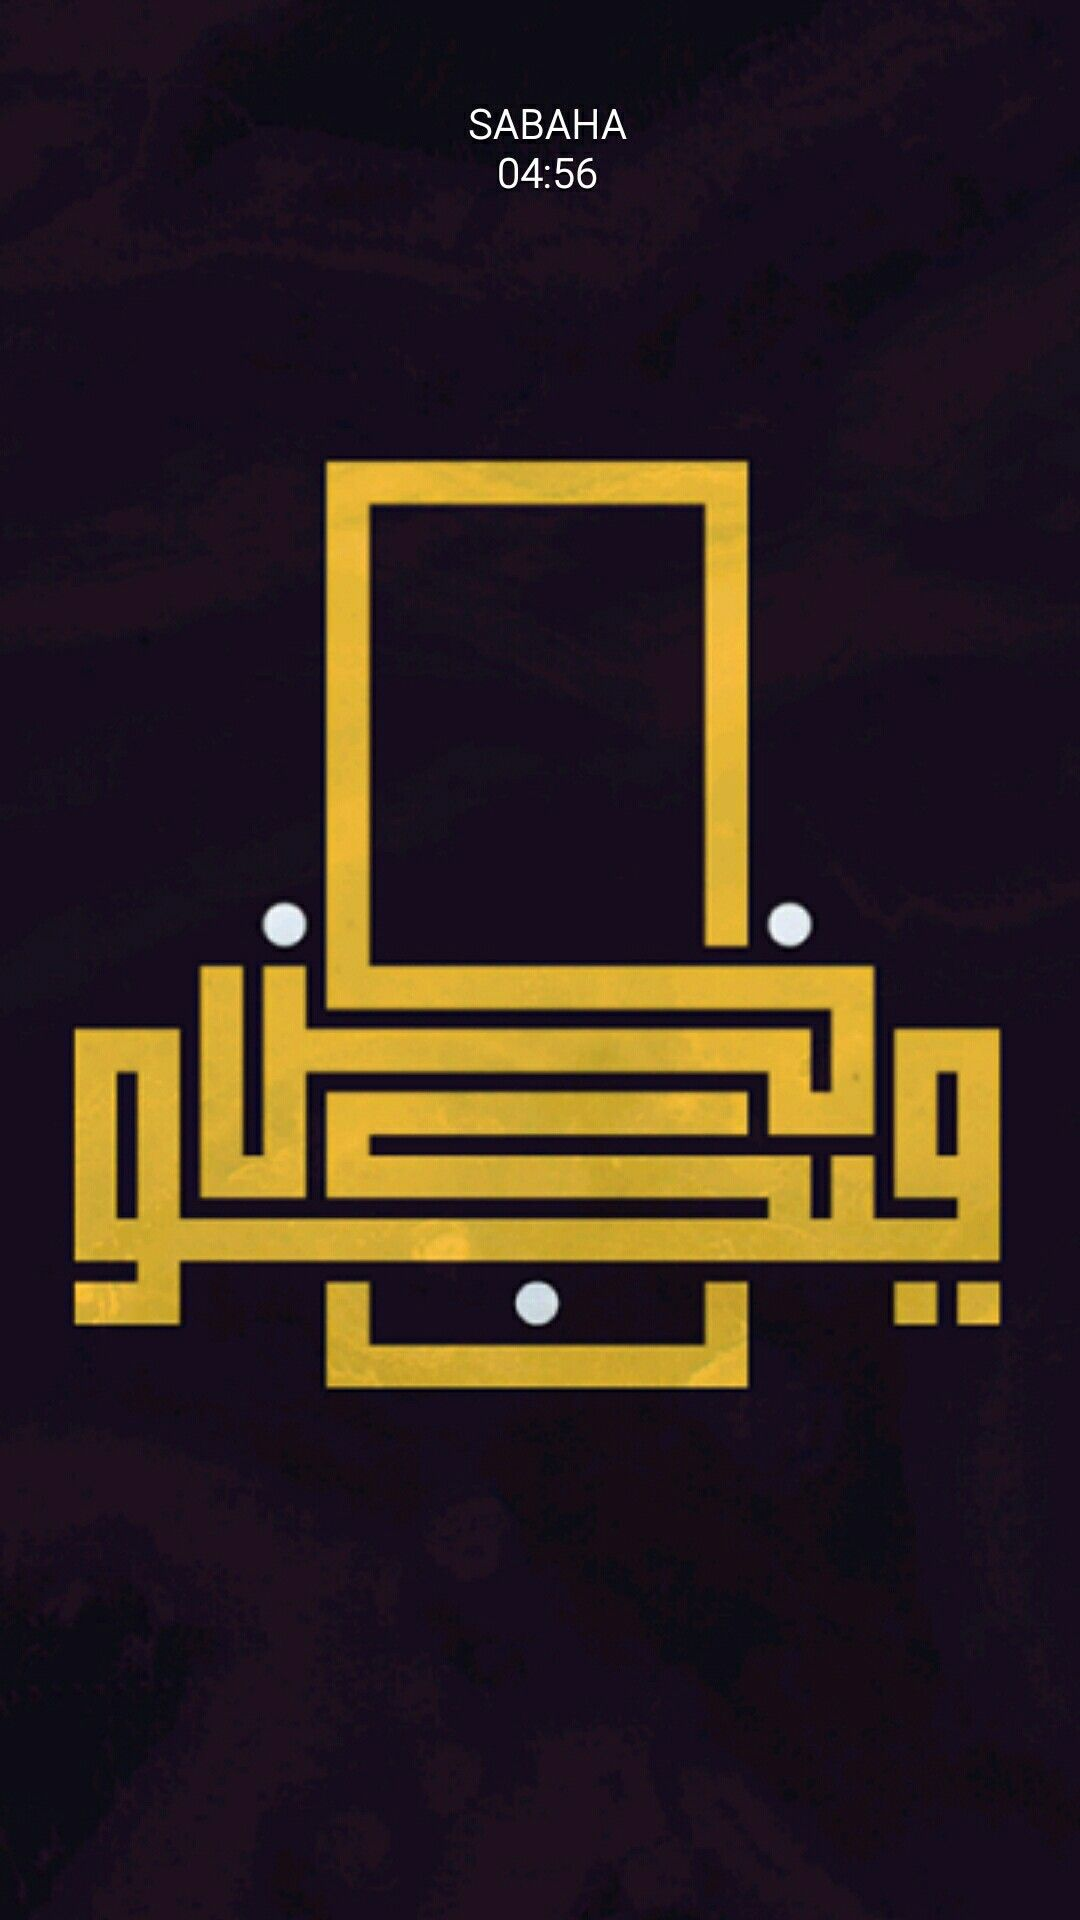 كن فيكون Islamic Art Calligraphy Calligraphy Art Islamic Calligraphy